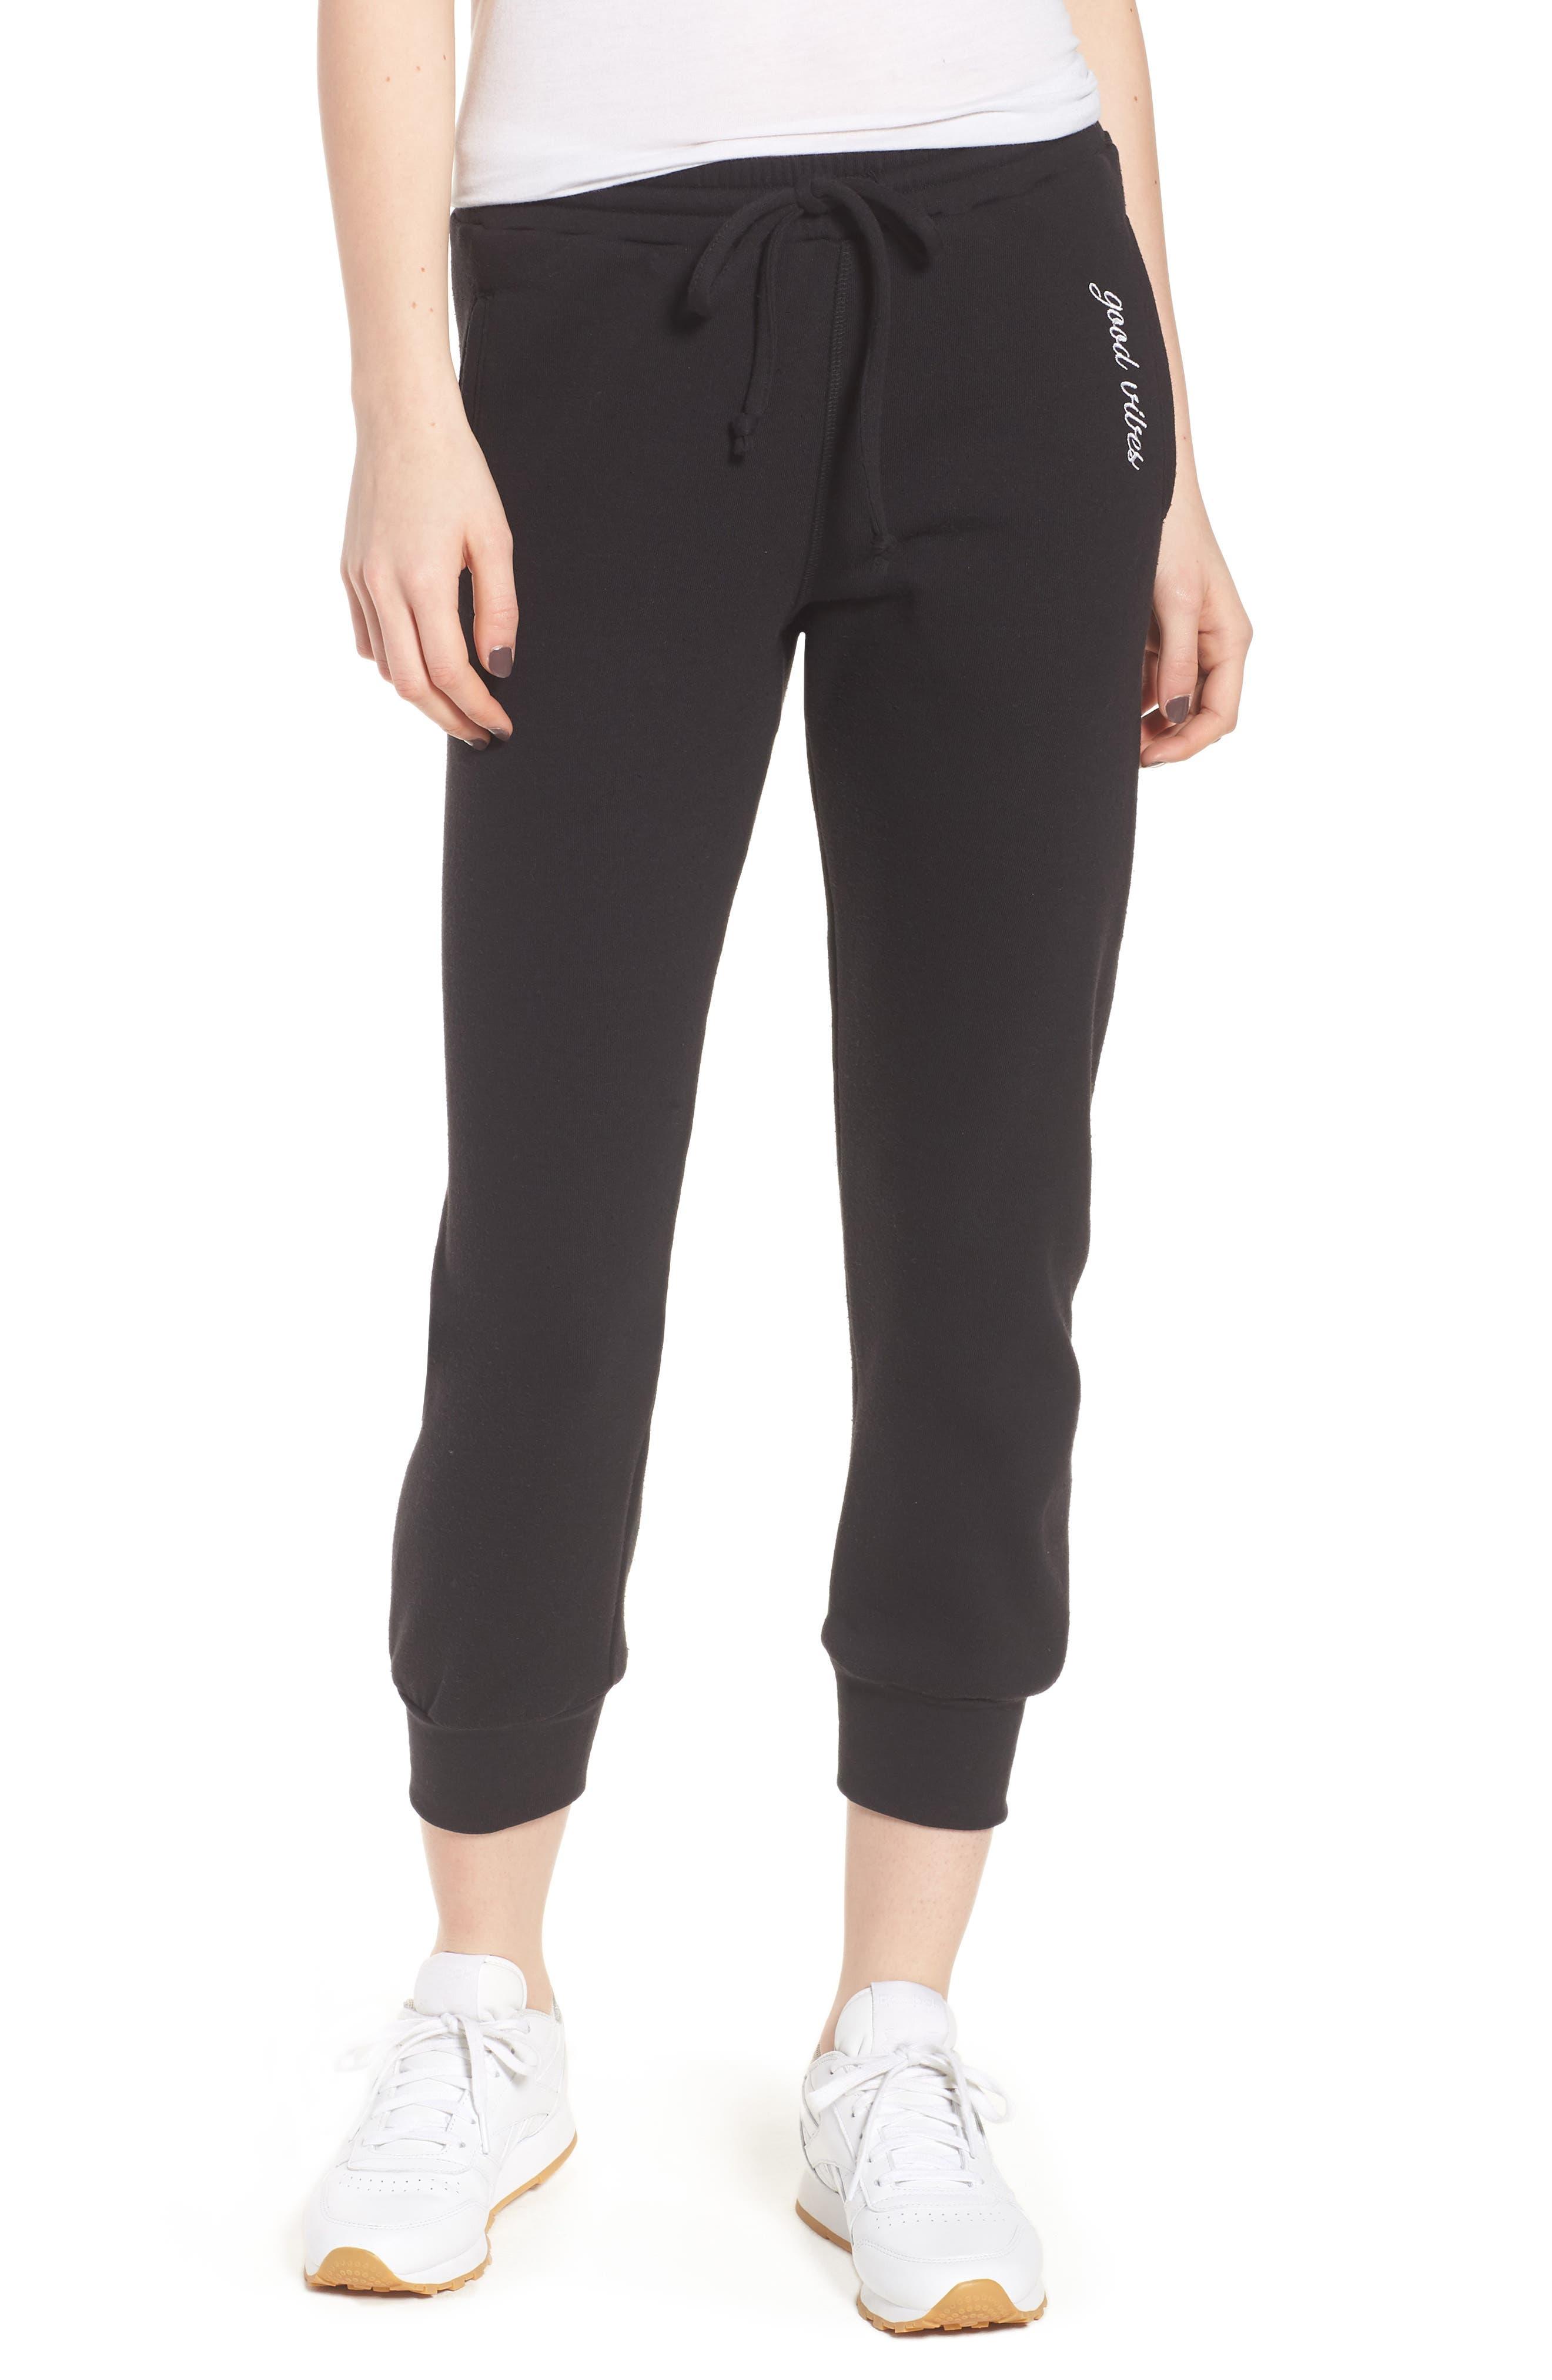 Cambridge Good Vibes Sweatpants,                         Main,                         color, Black